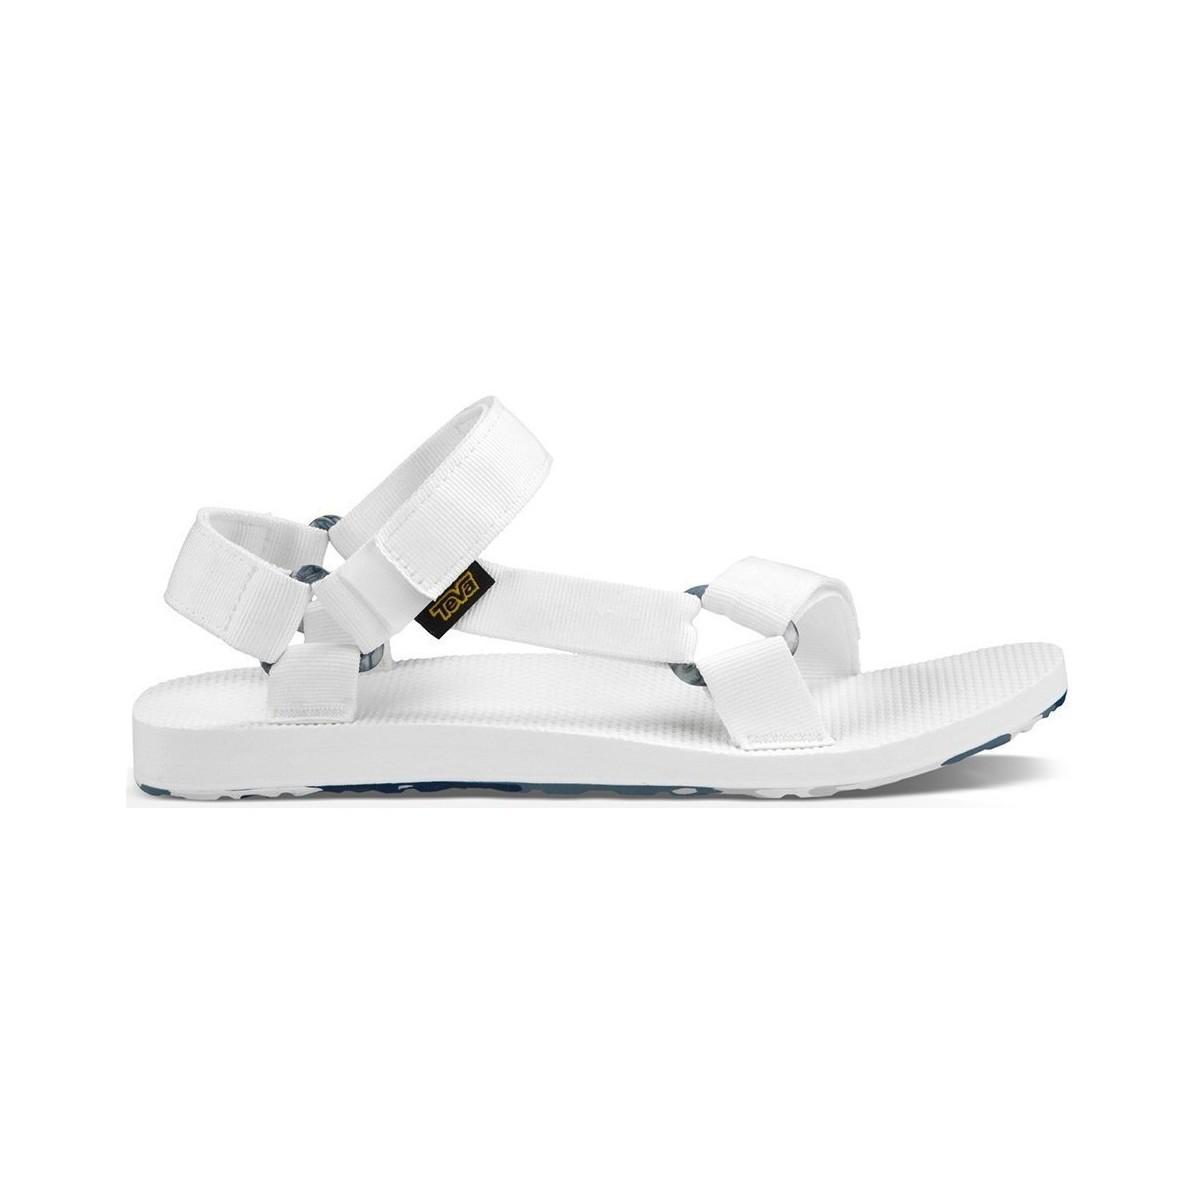 be2da5695 Teva Original Men s Sandals In White in White for Men - Lyst